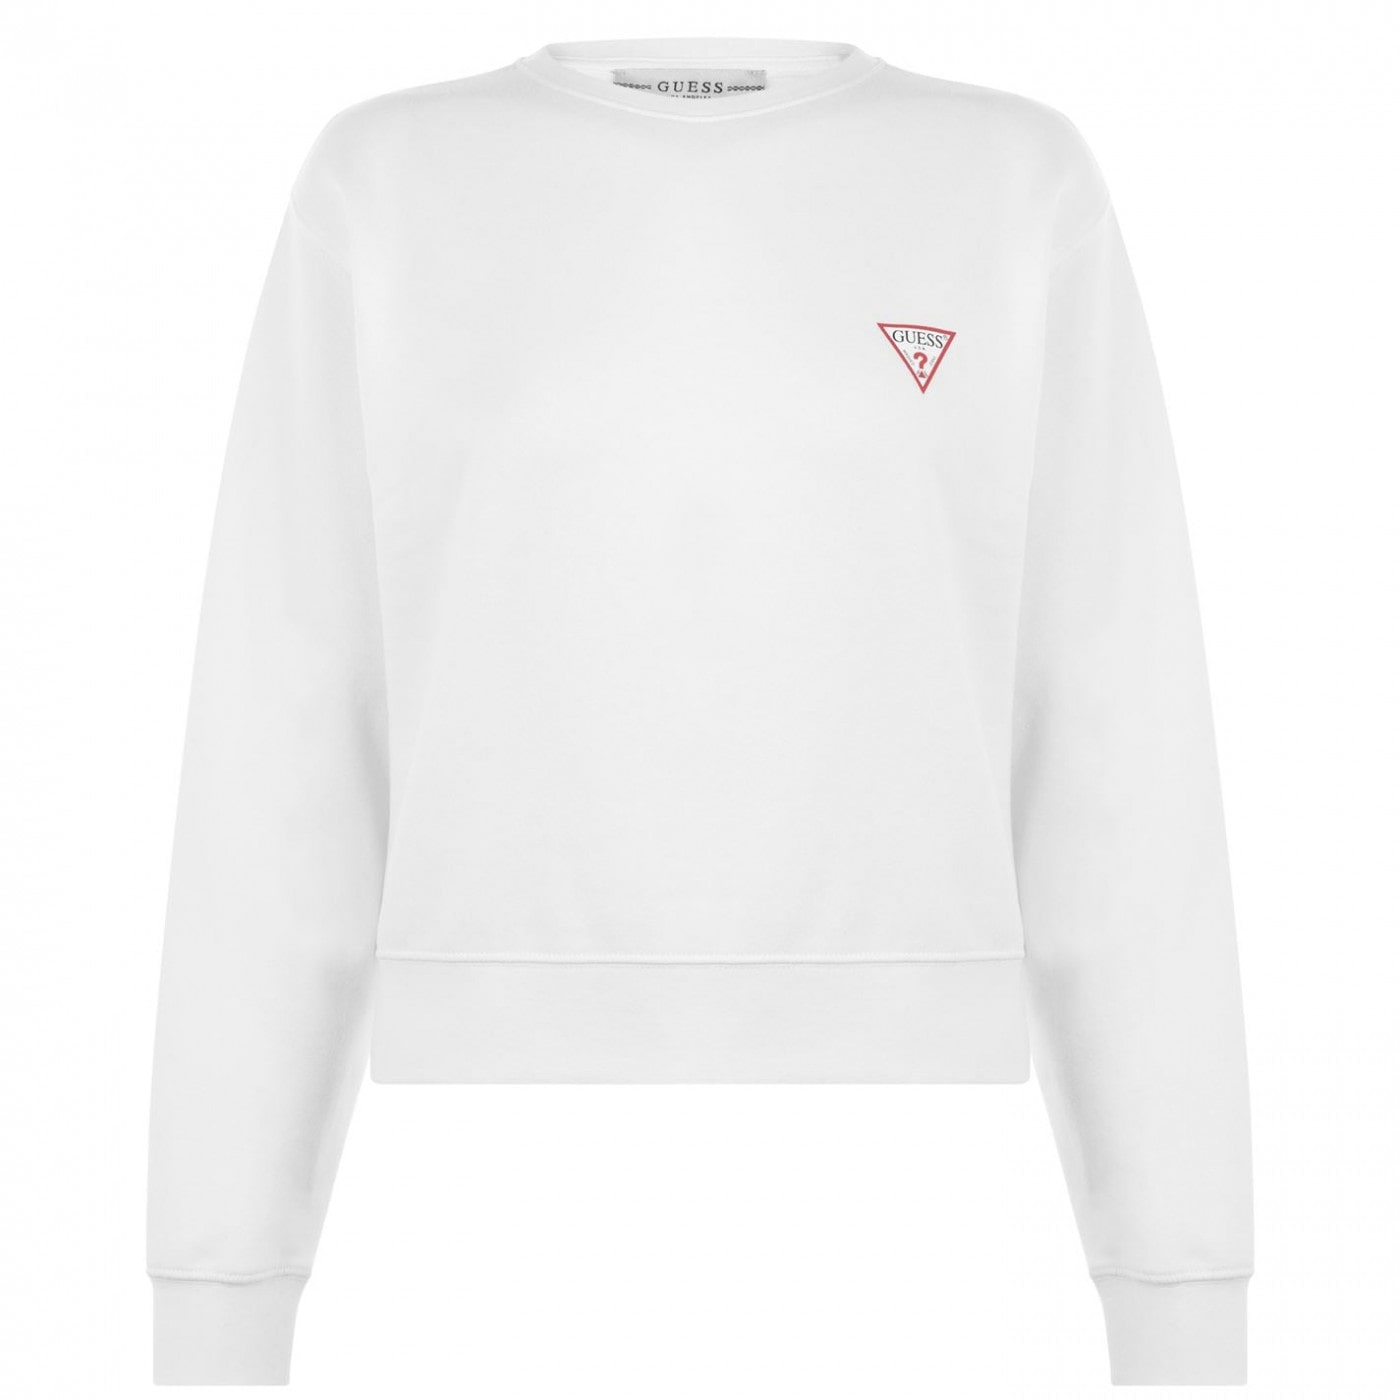 Guess Basic Sweater